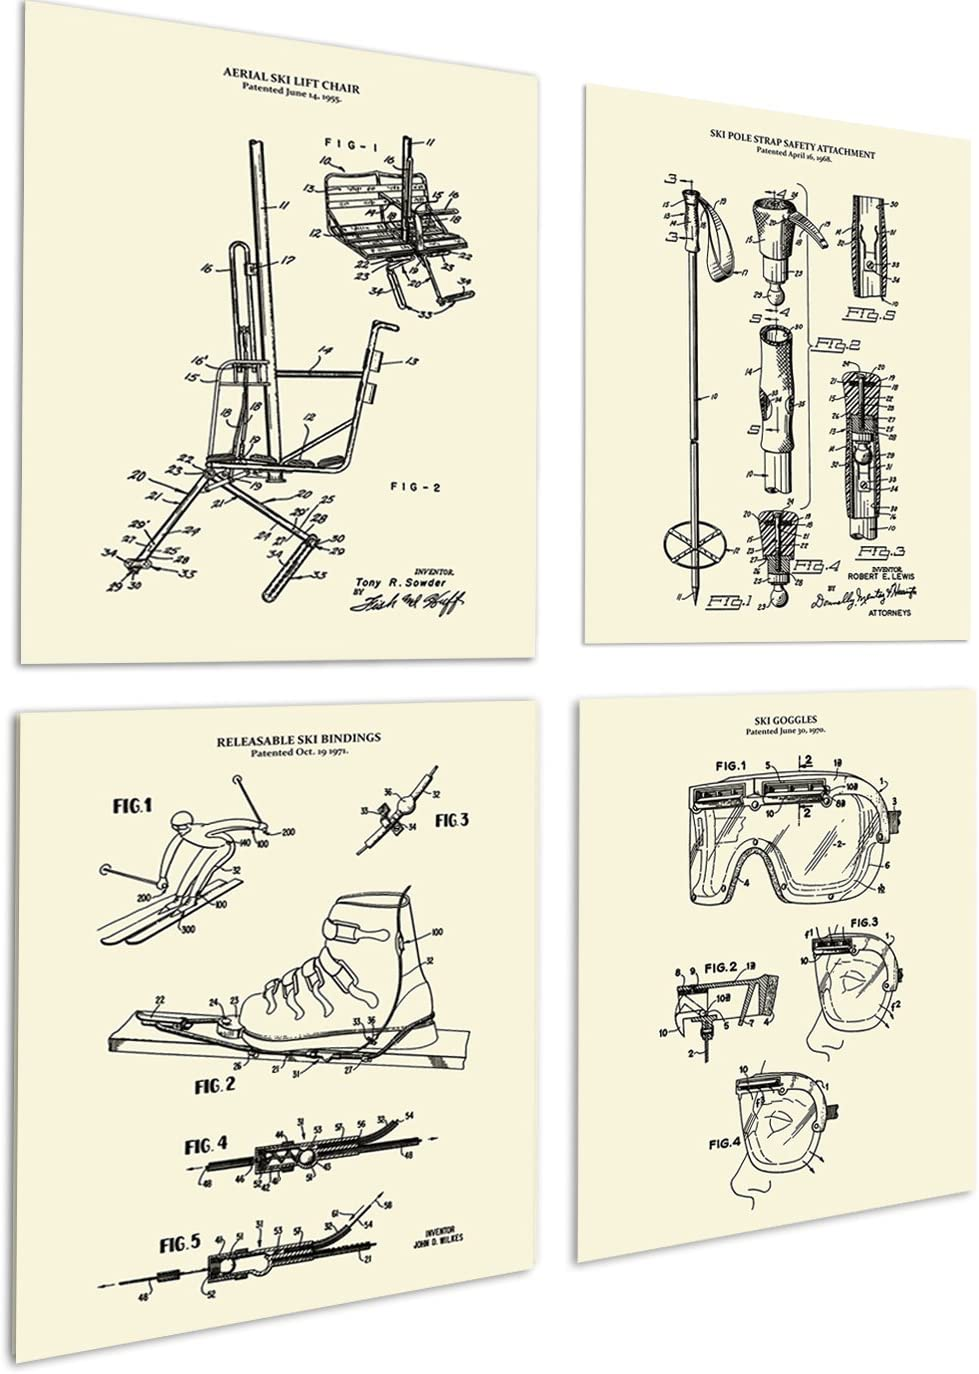 Ski Decor for Home Set of 4 Unframed Ski Wall Art Prints in Cream Color Patents_Ski_Crm4A